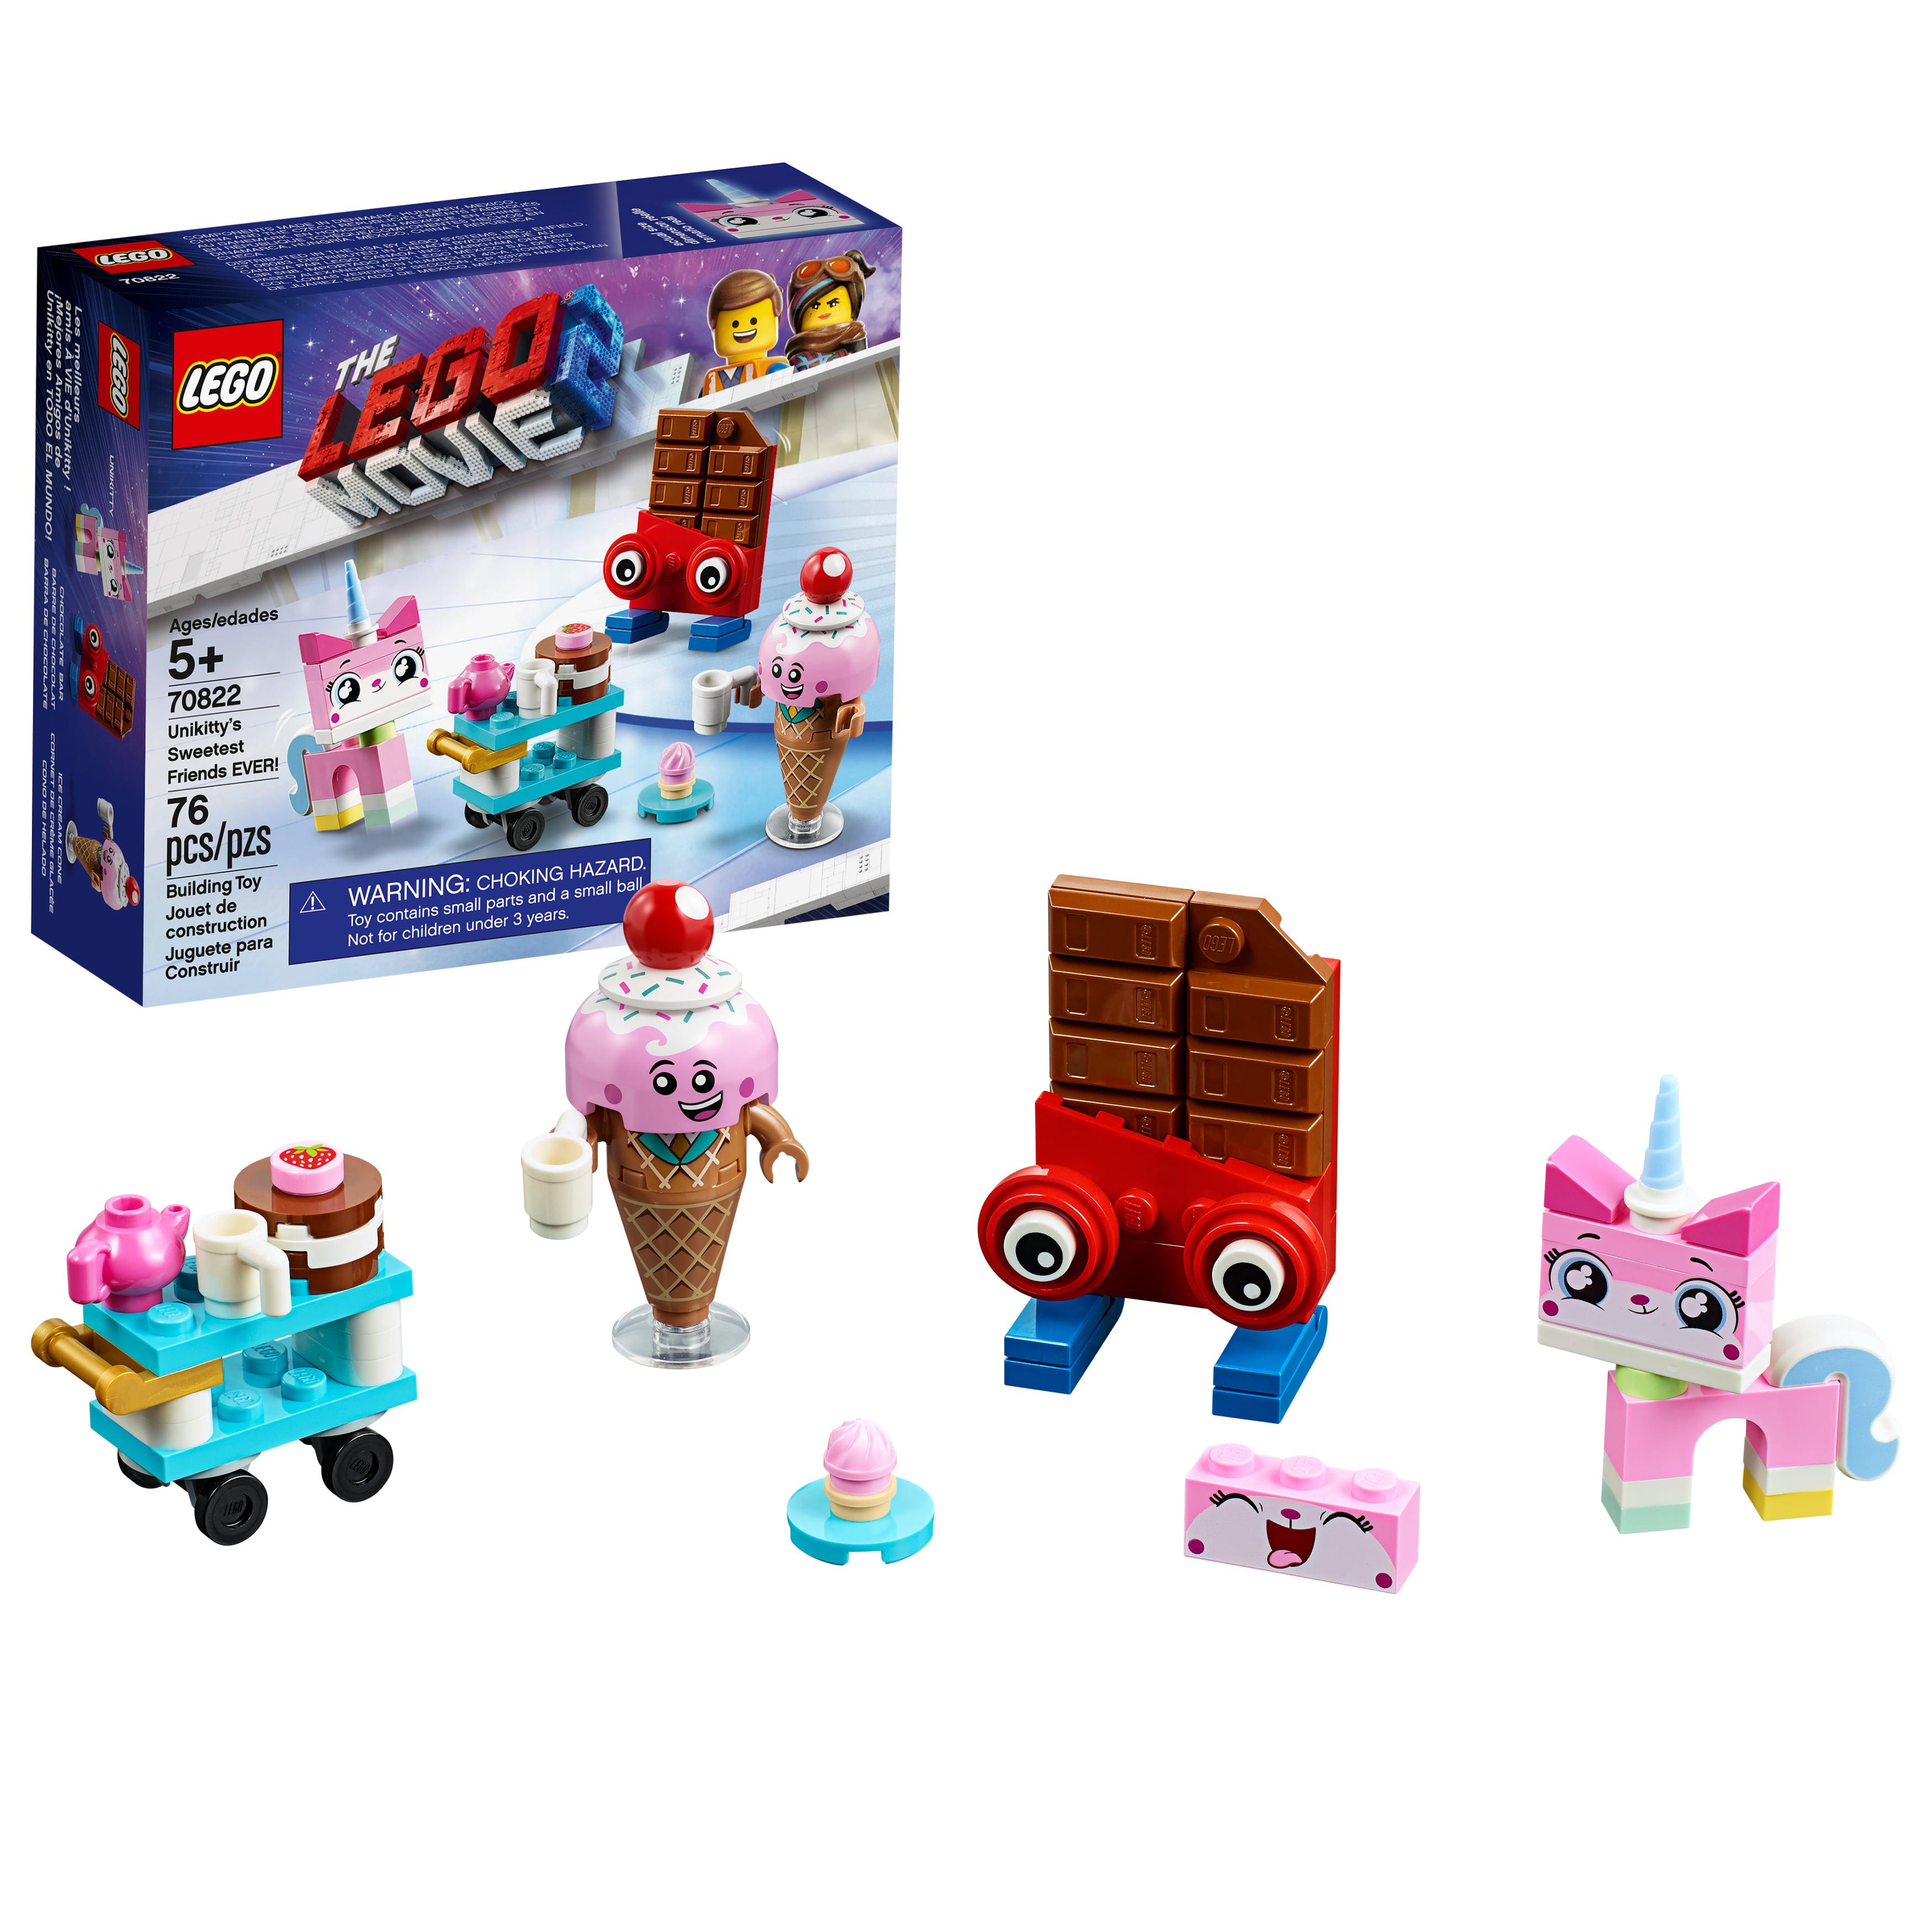 LEGO Movie Unikitty's Sweetest Friends EVER! 70822